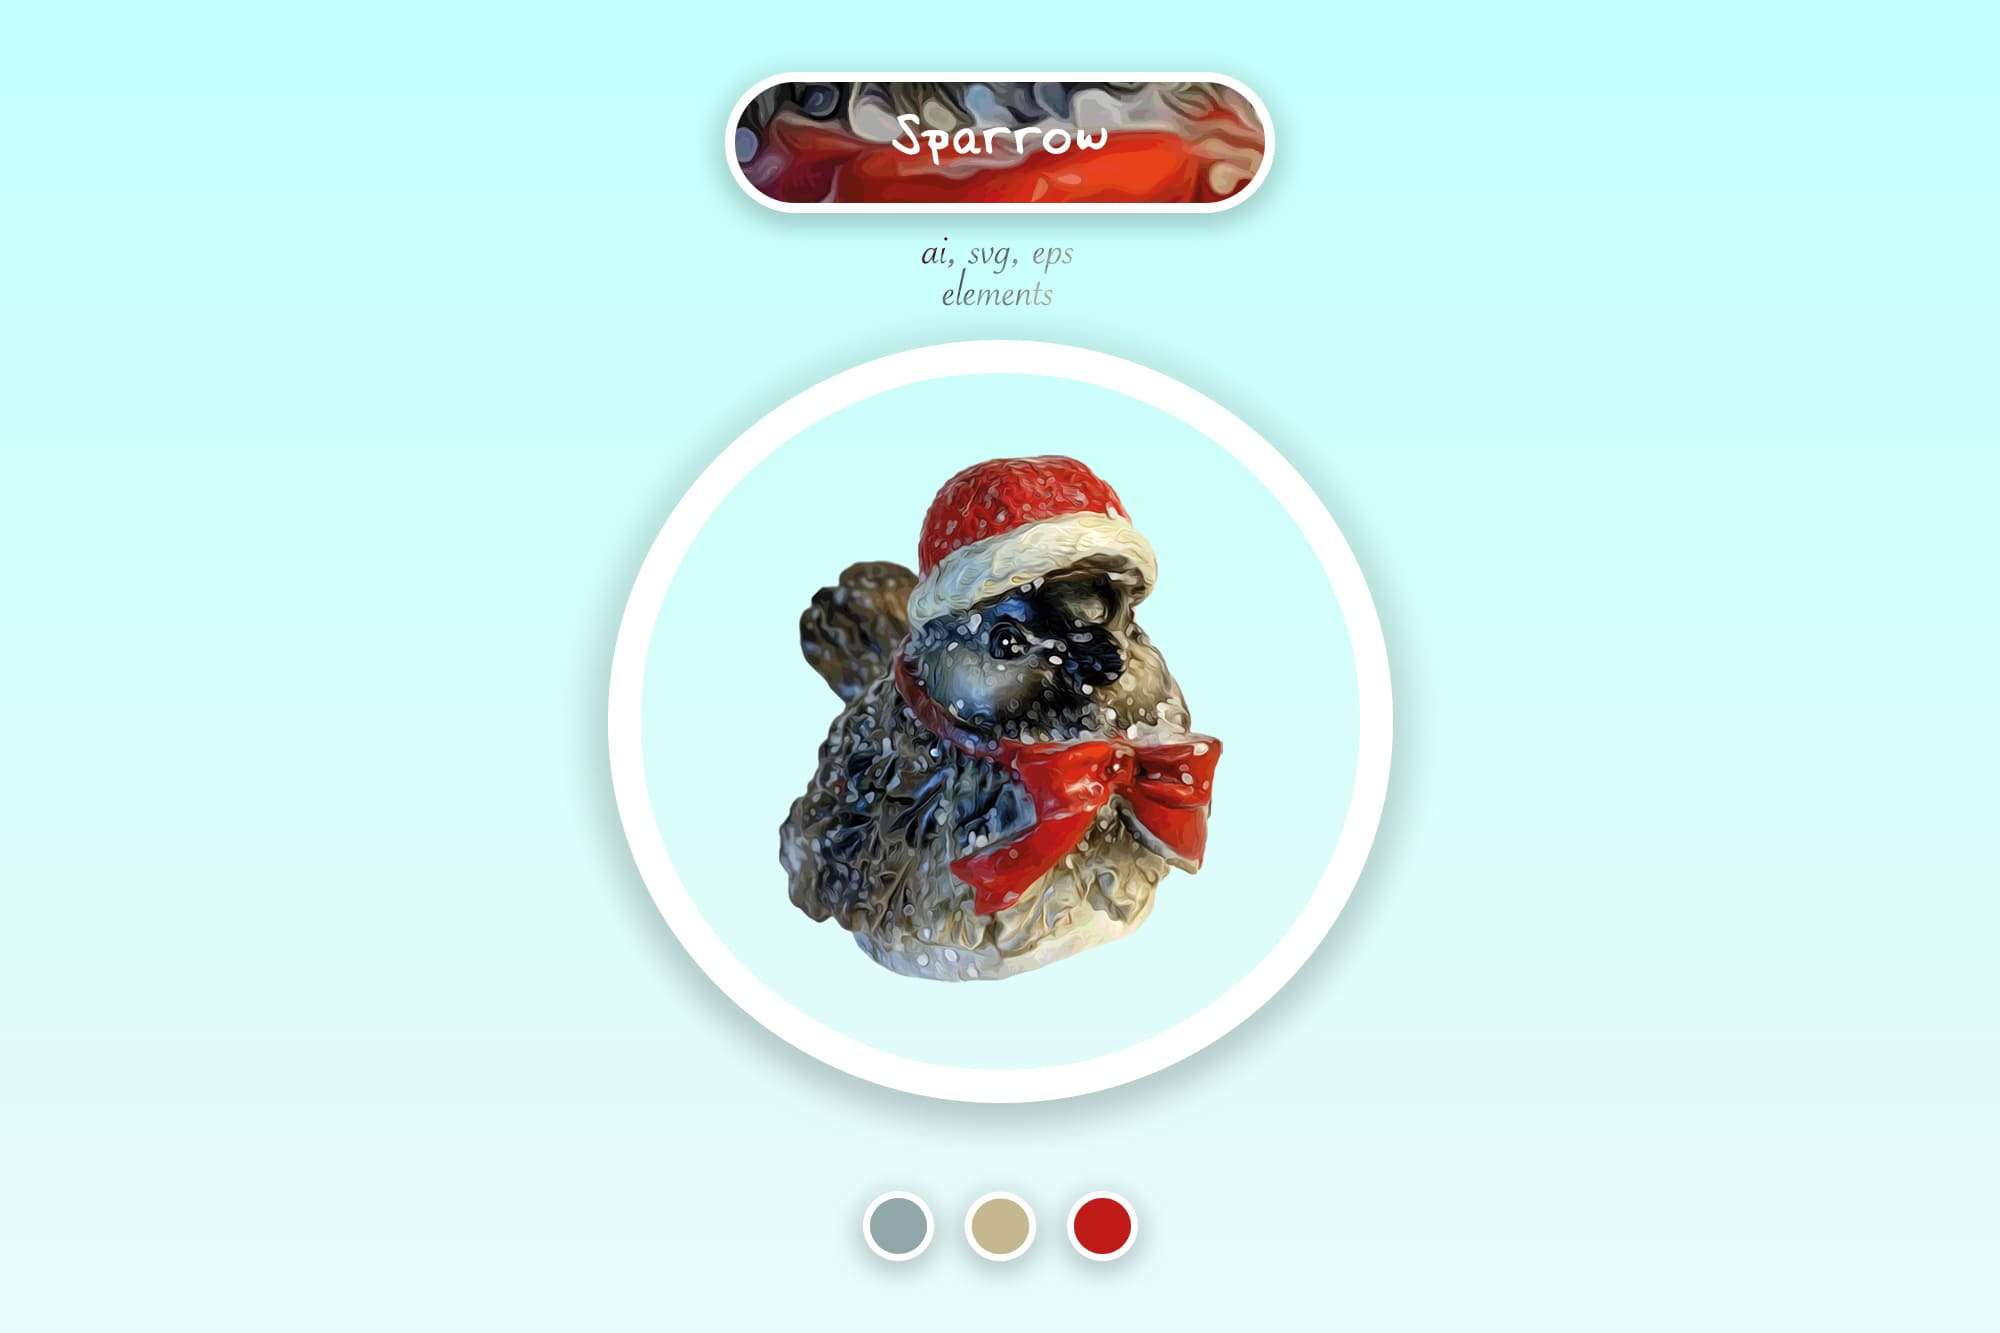 496 Christmas Illustrations: Christmas Vectors Bundle SVG, EPS, AI - Sparrow a